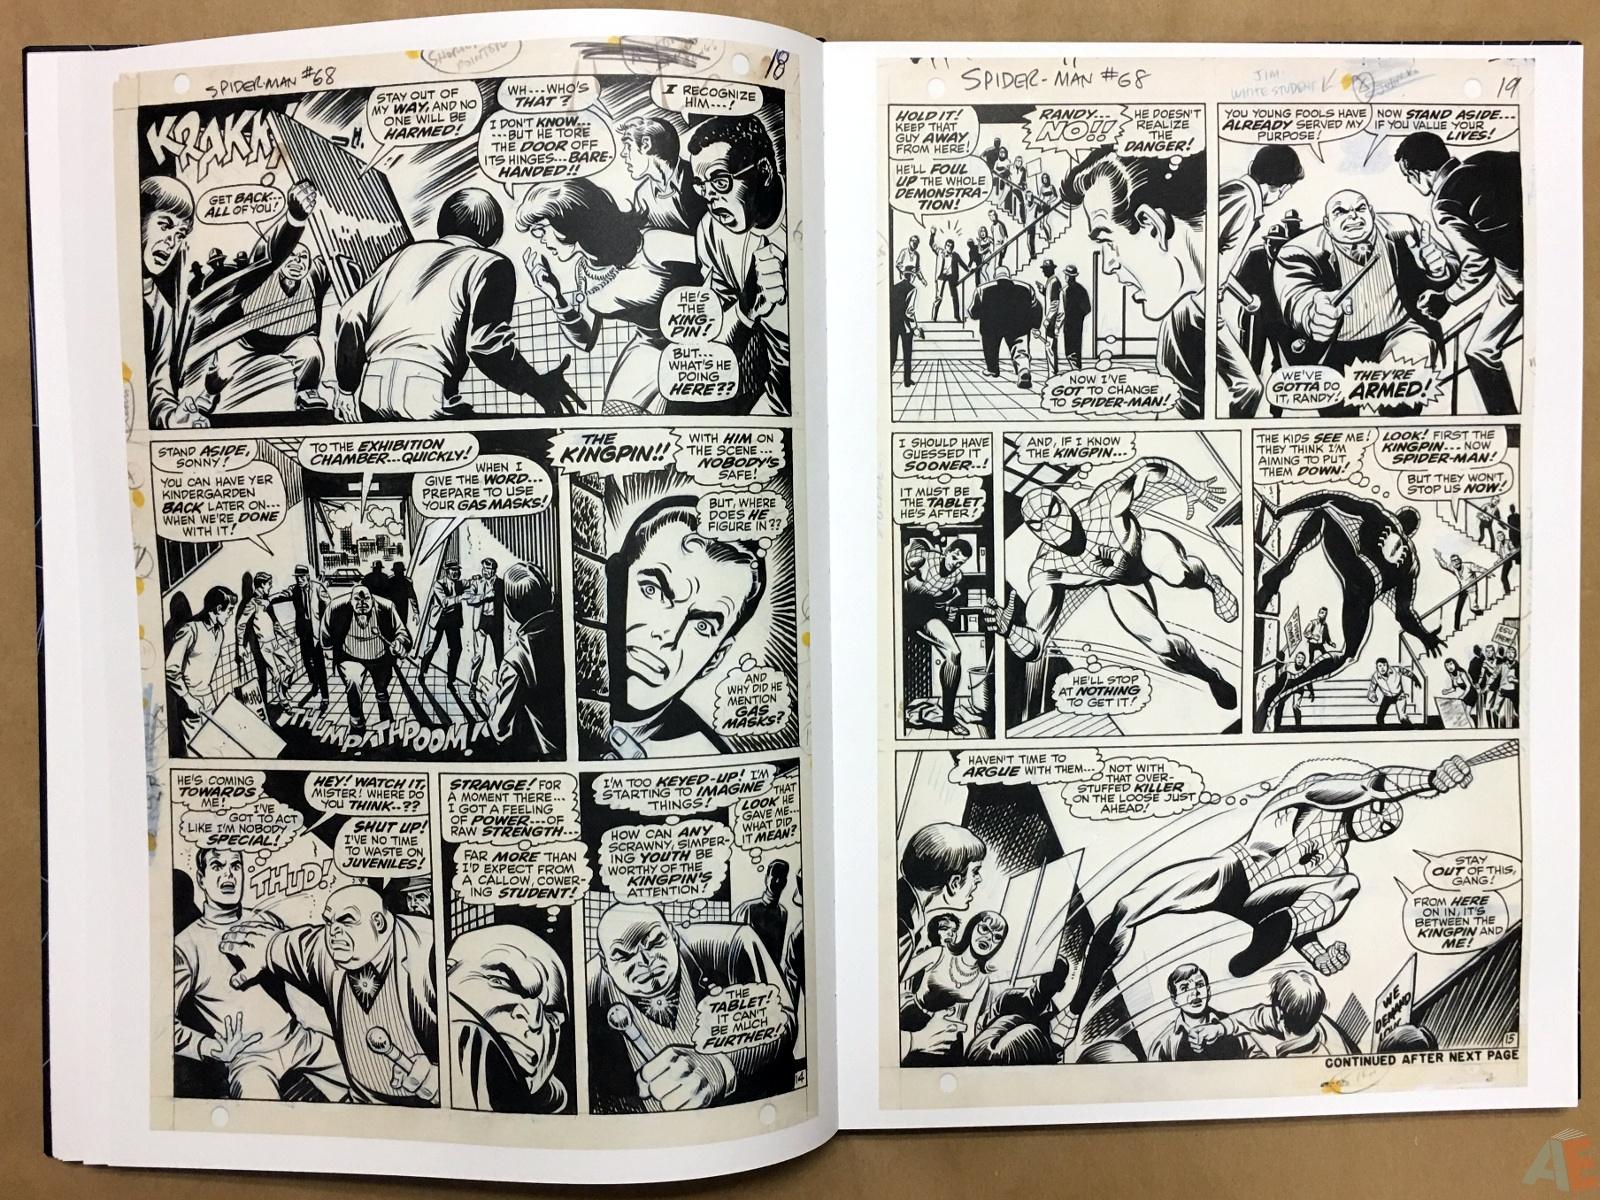 John Romita's The Amazing Spider-Man Artist's Edition 16